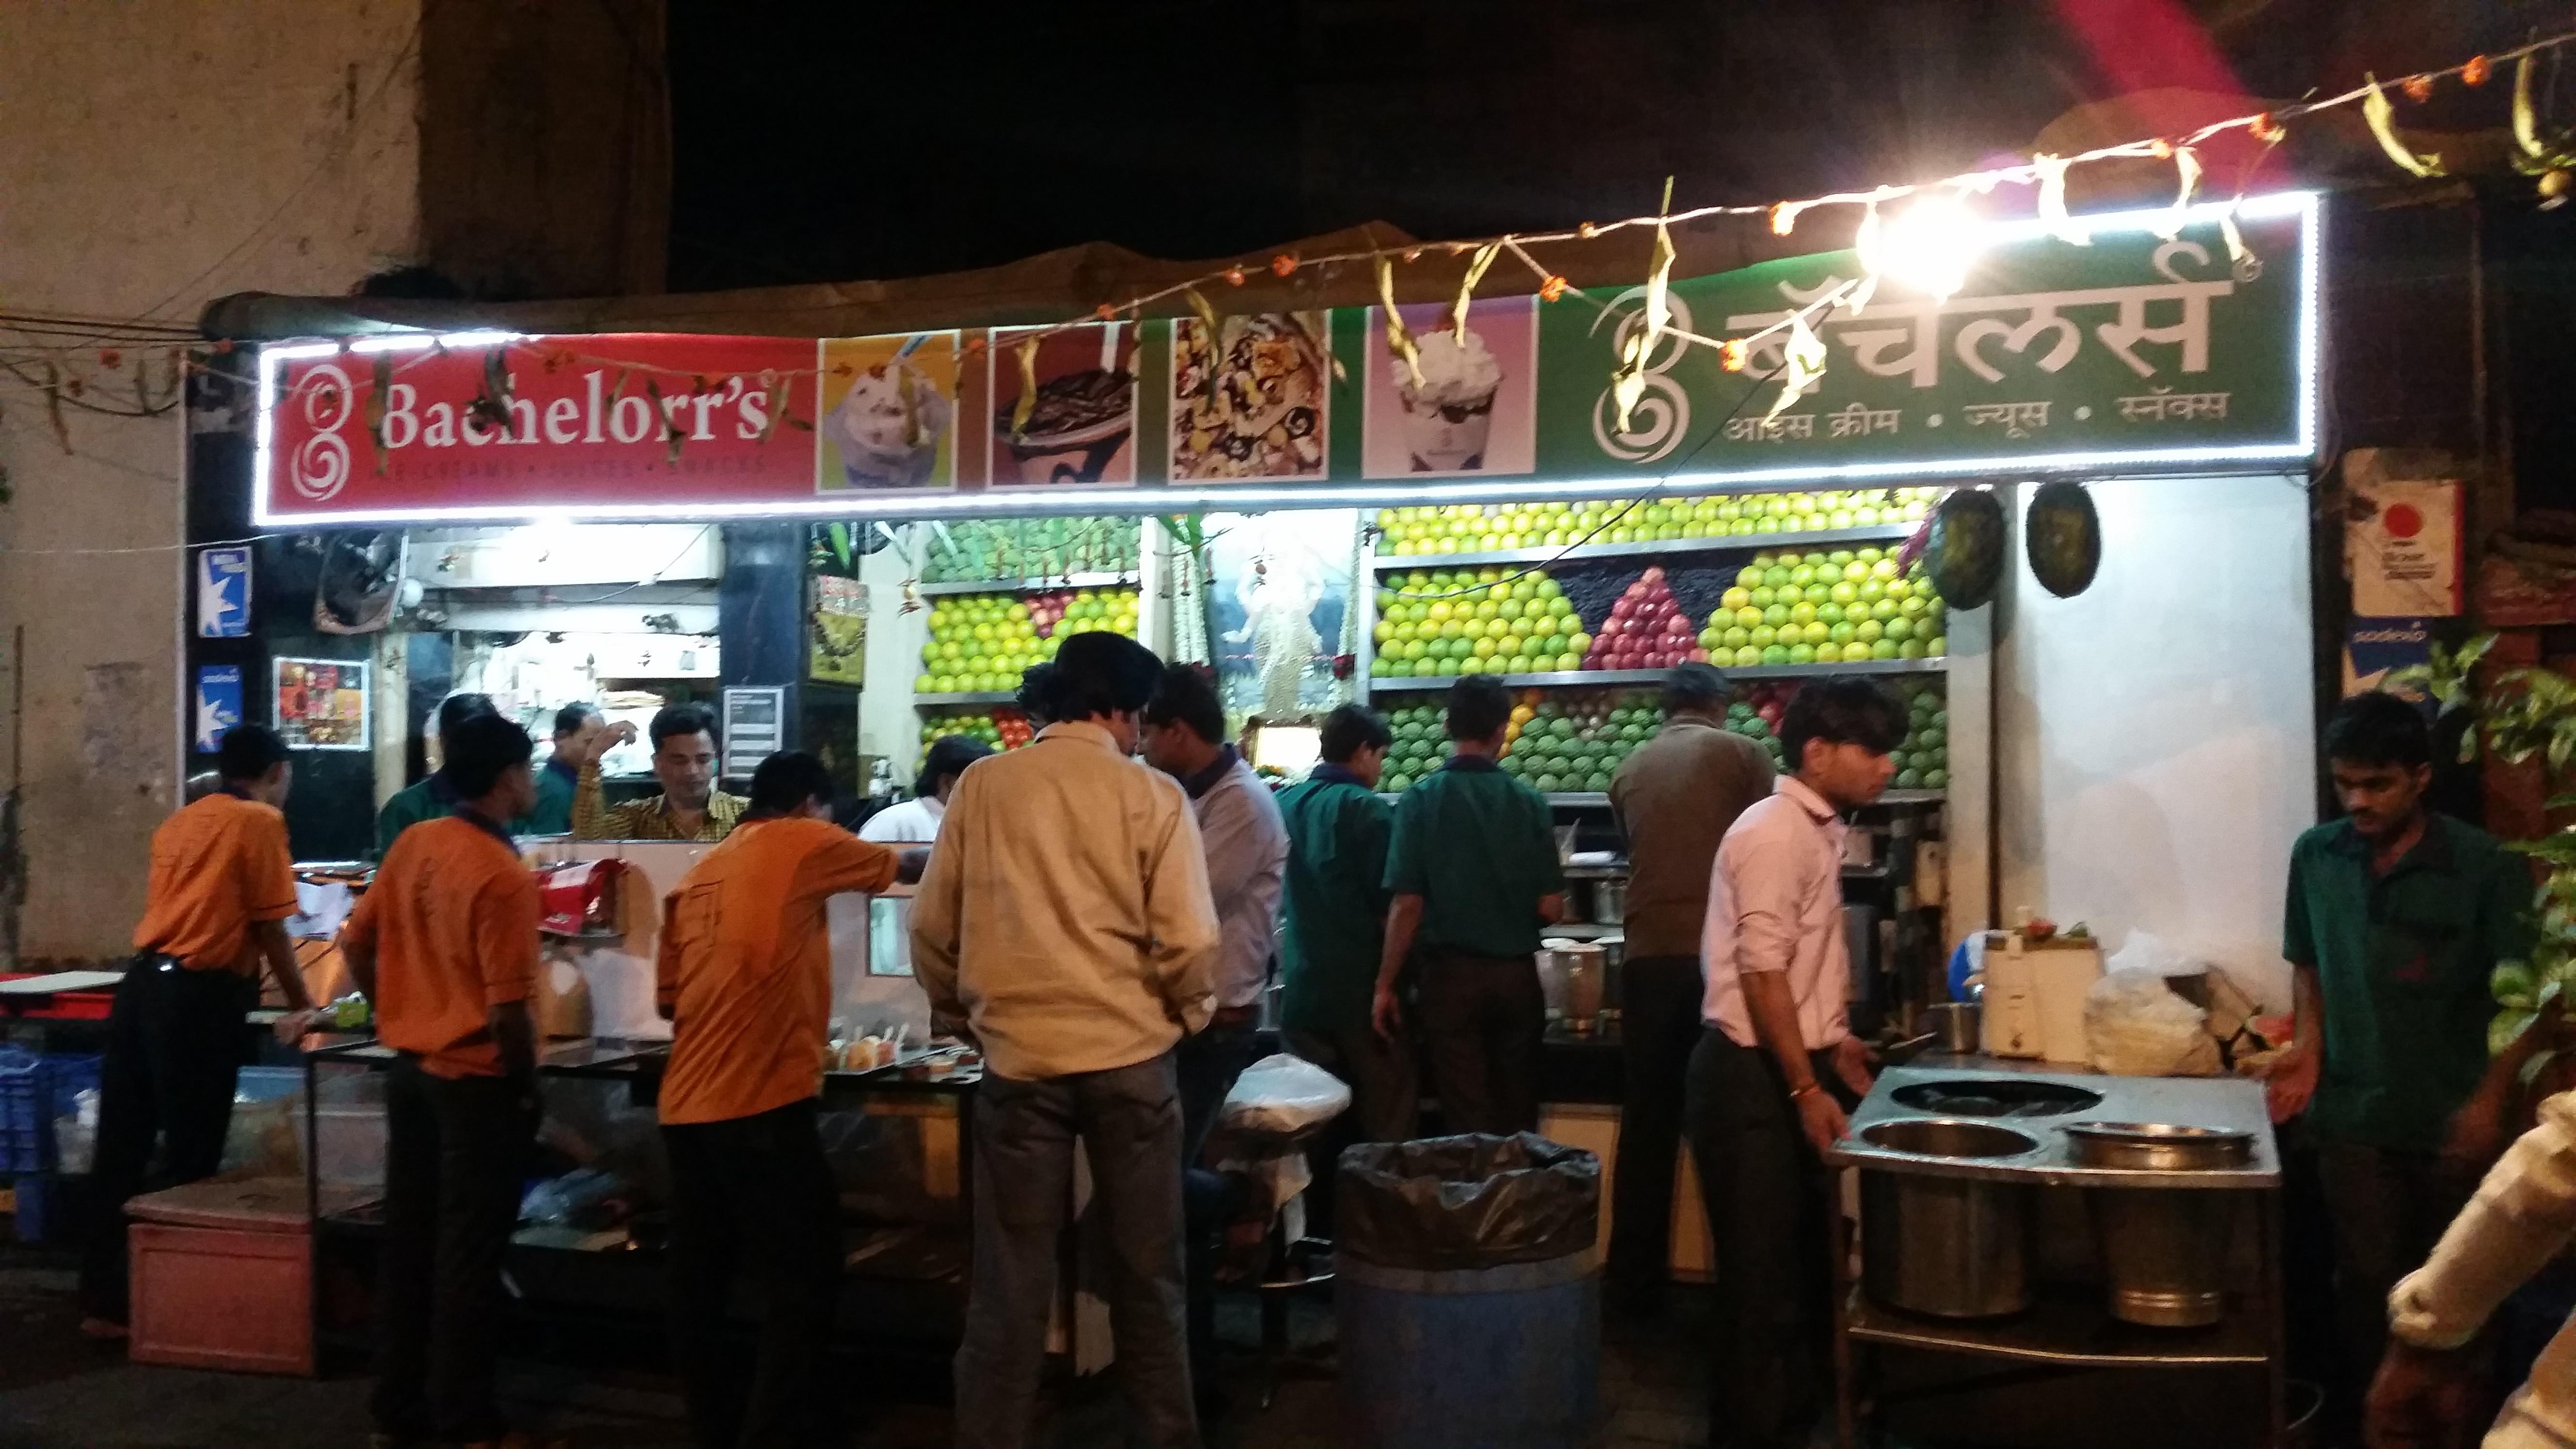 10 best street foods in Mumbai, Bachelors Mumbai